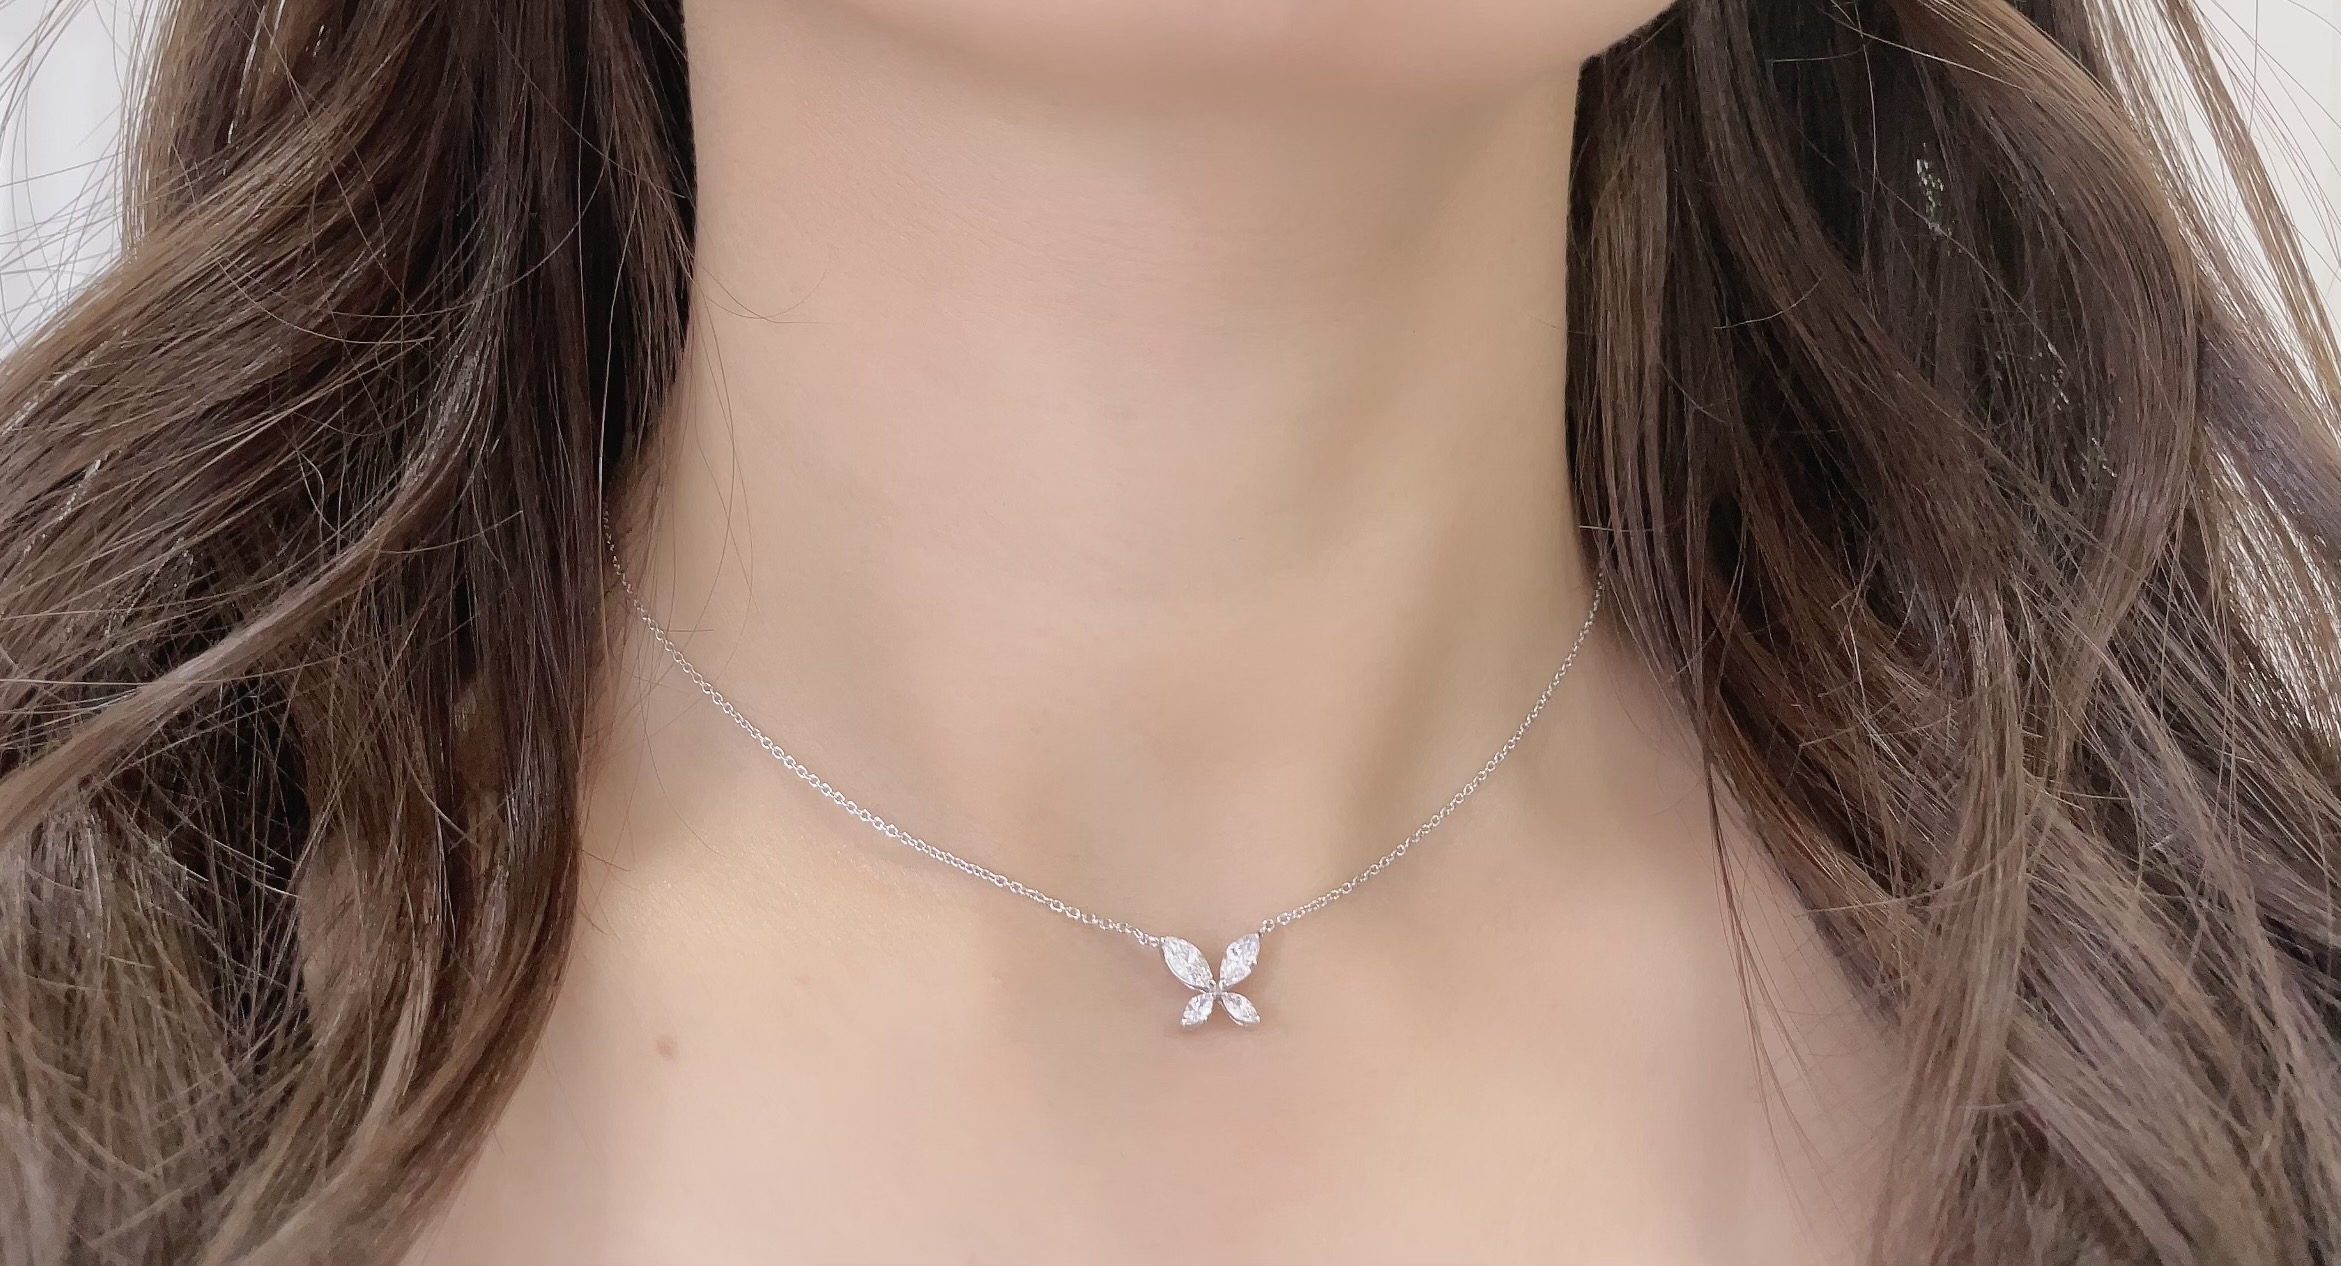 【selva secreta】Butterfly Necklace